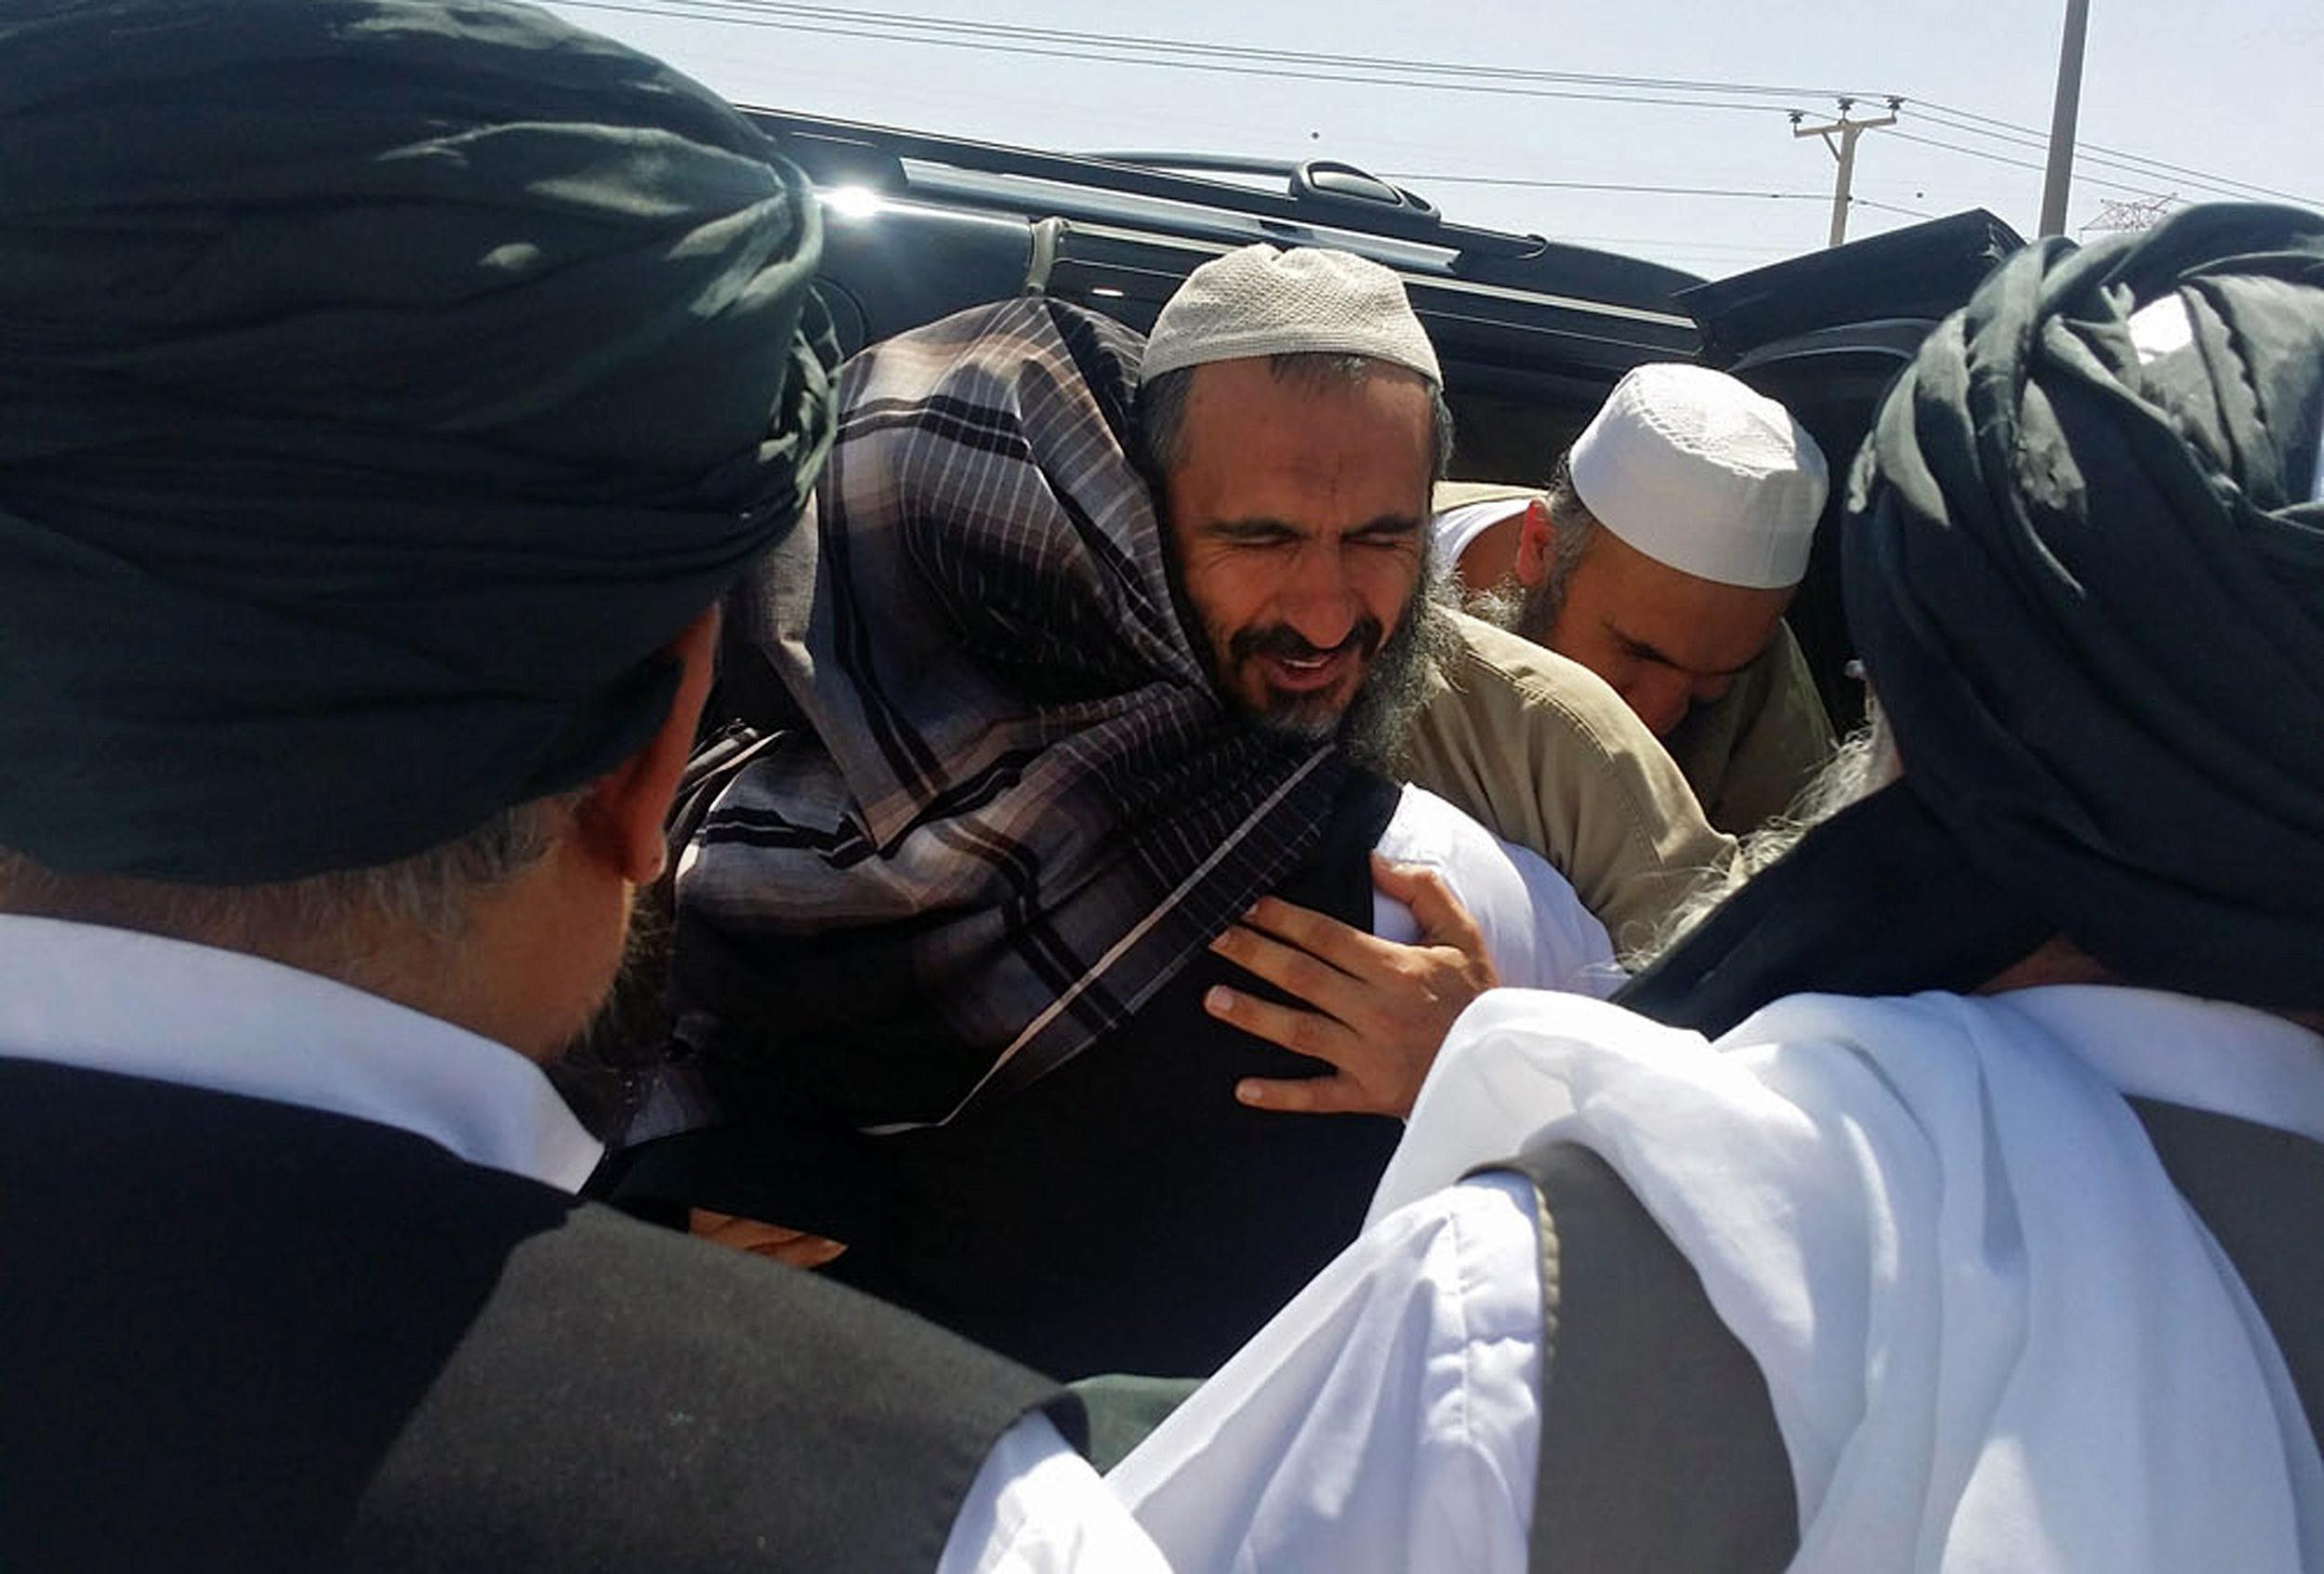 Image: QATAR-AFGHANISTAN-TALIBAN-UNREST-US